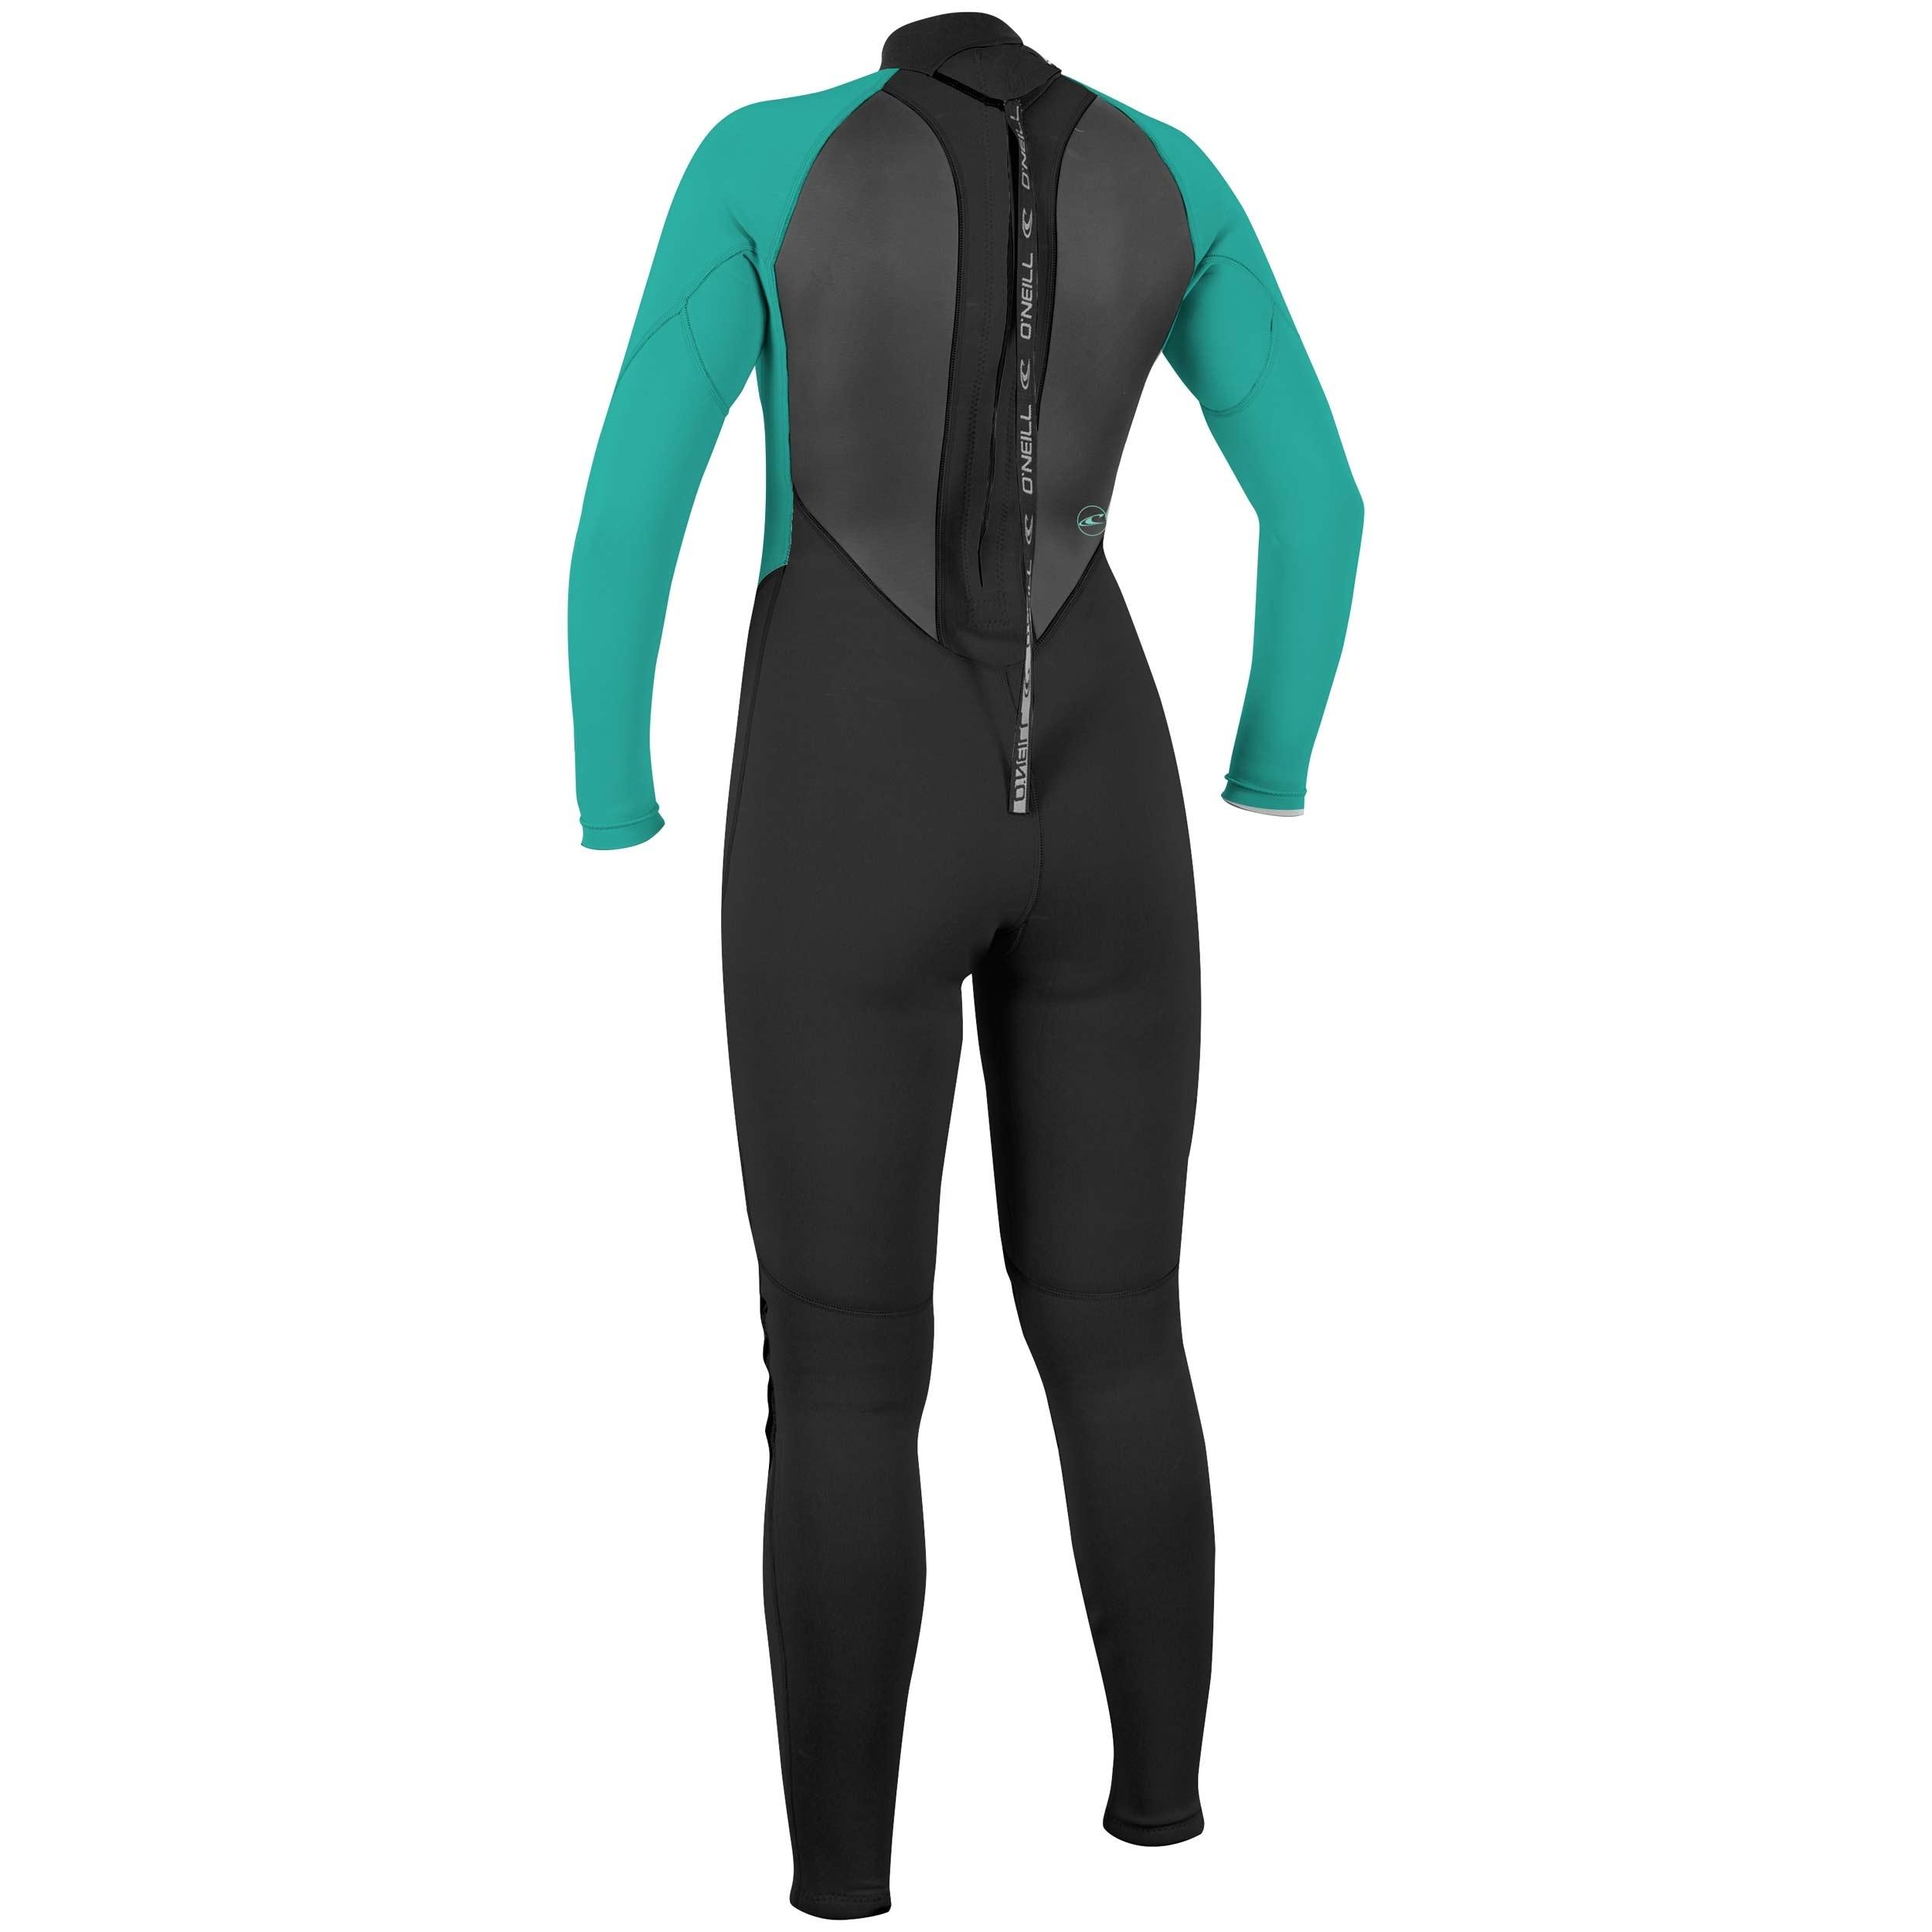 O/'Neill Full Suit Reactor Wet Suit Women/'s Black